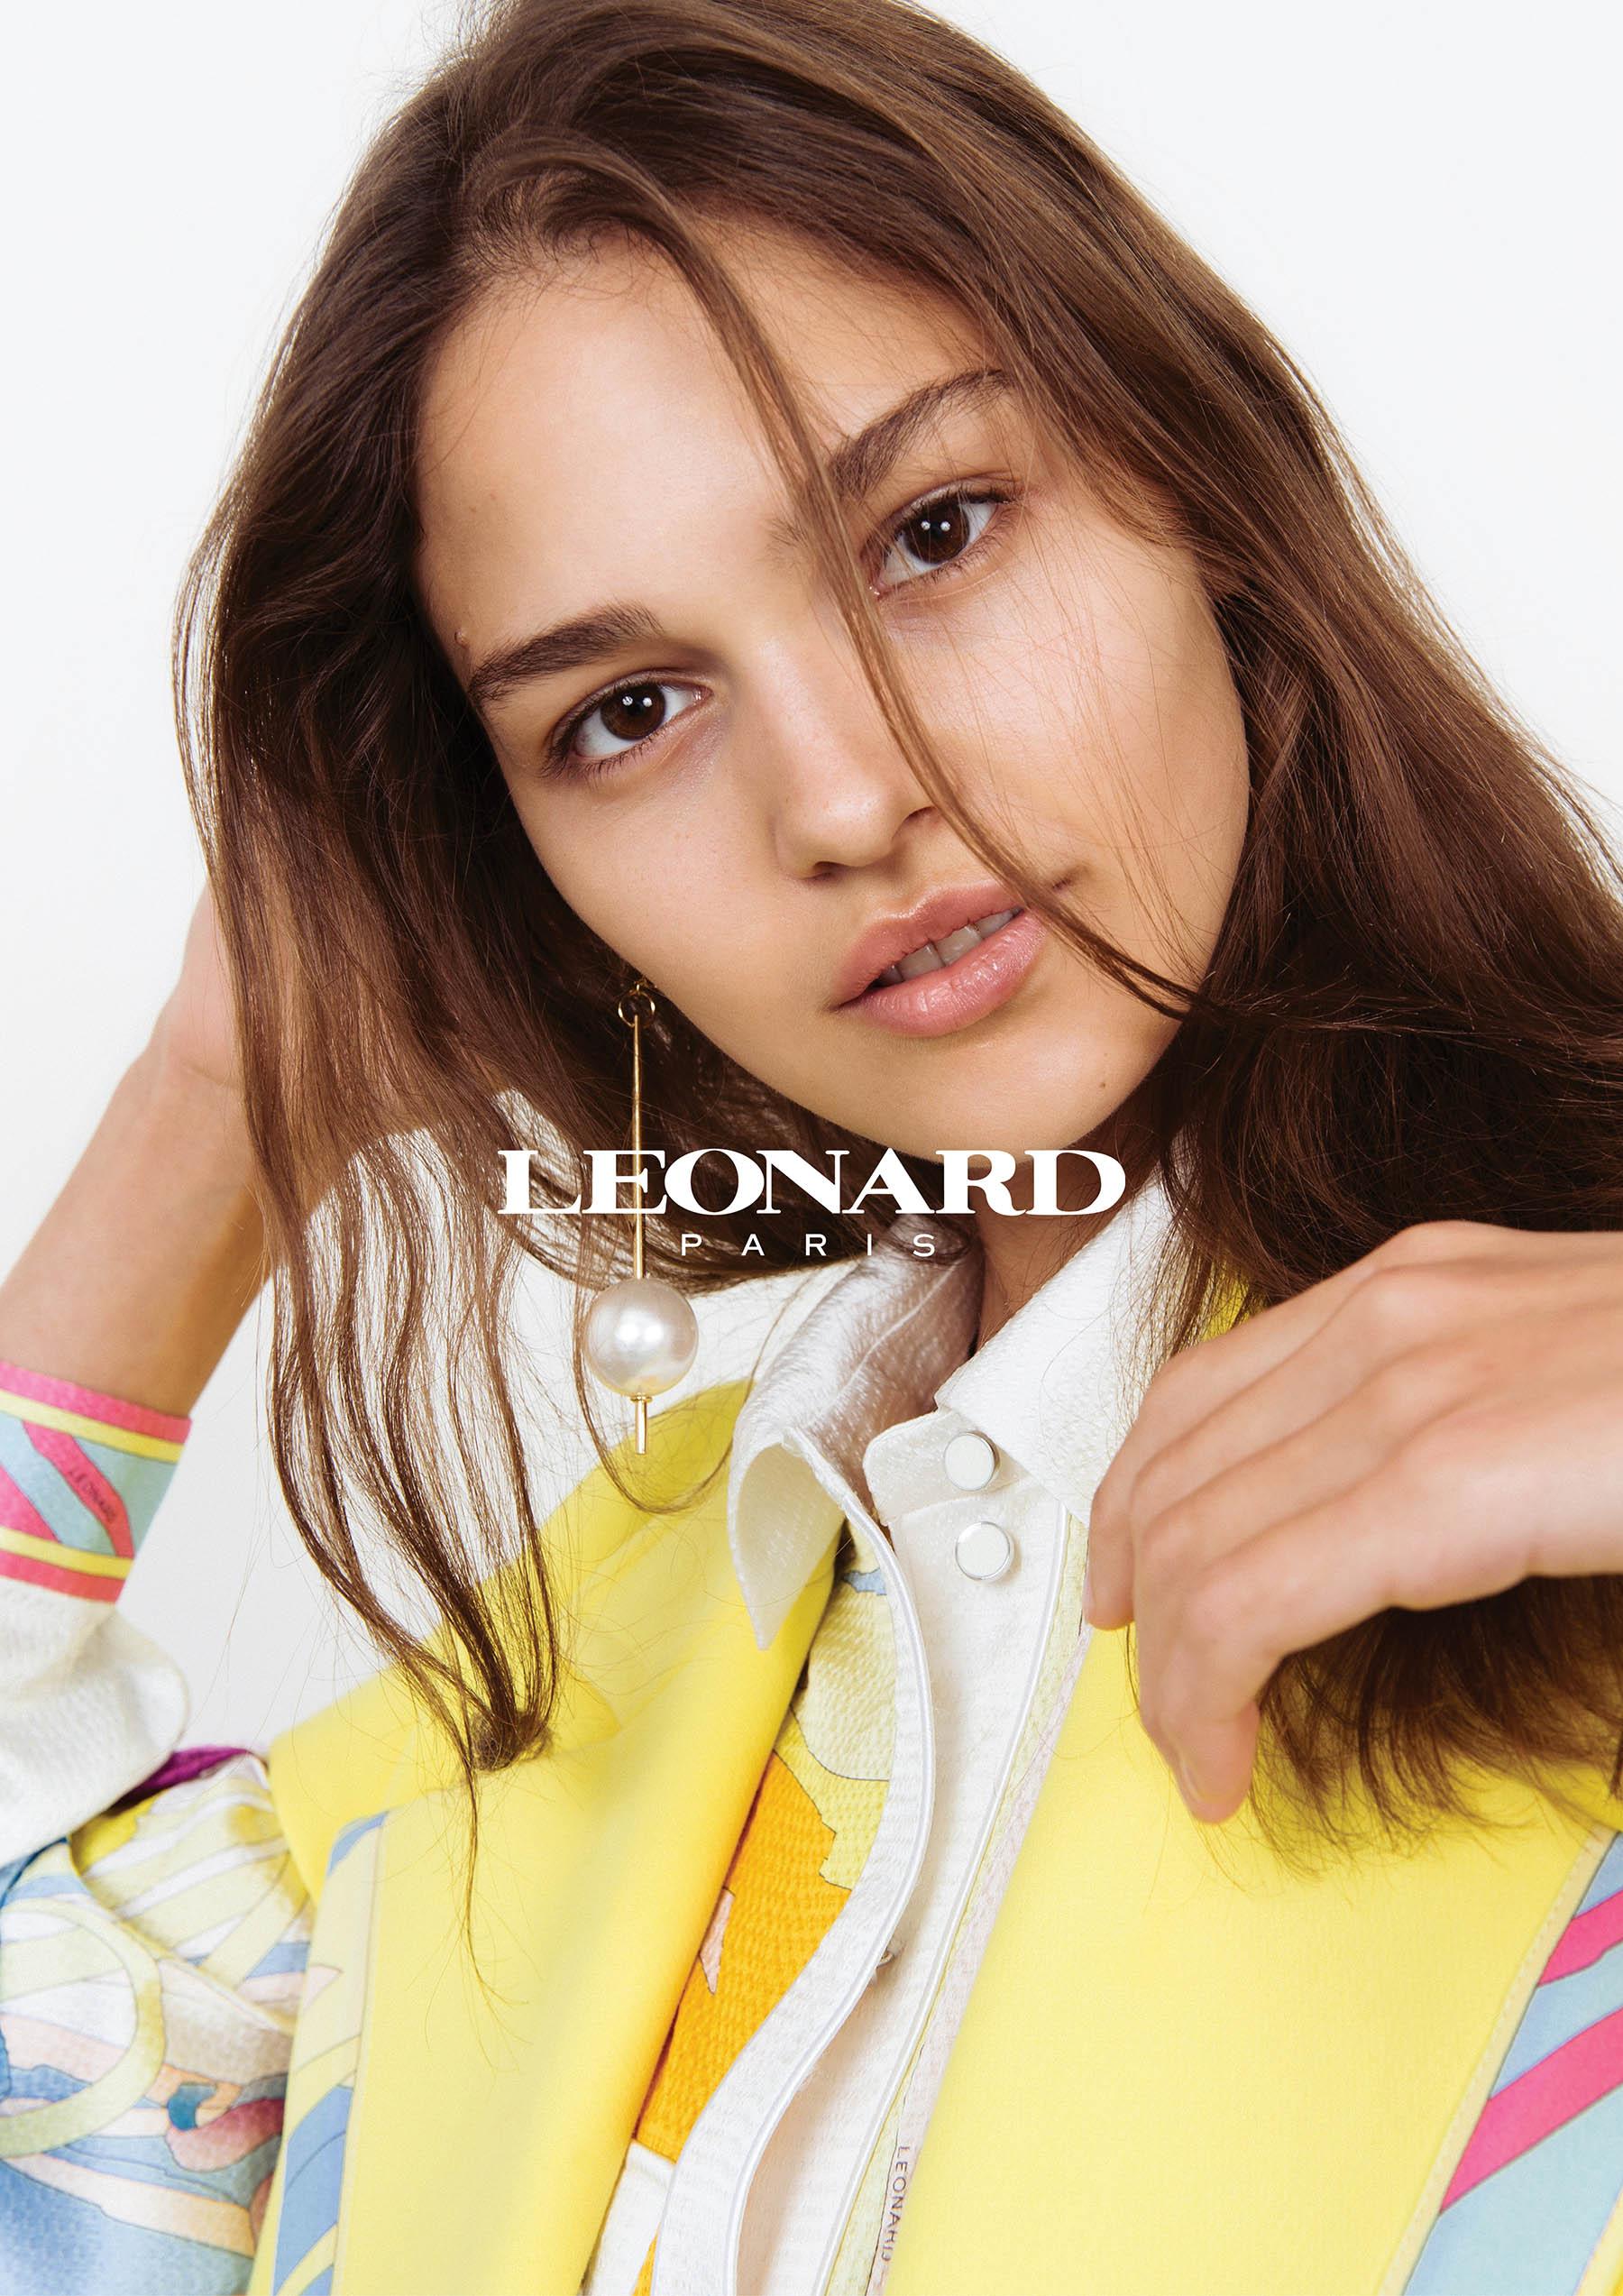 Leonard Paris - Looks - 18 UPDATE4.jpg